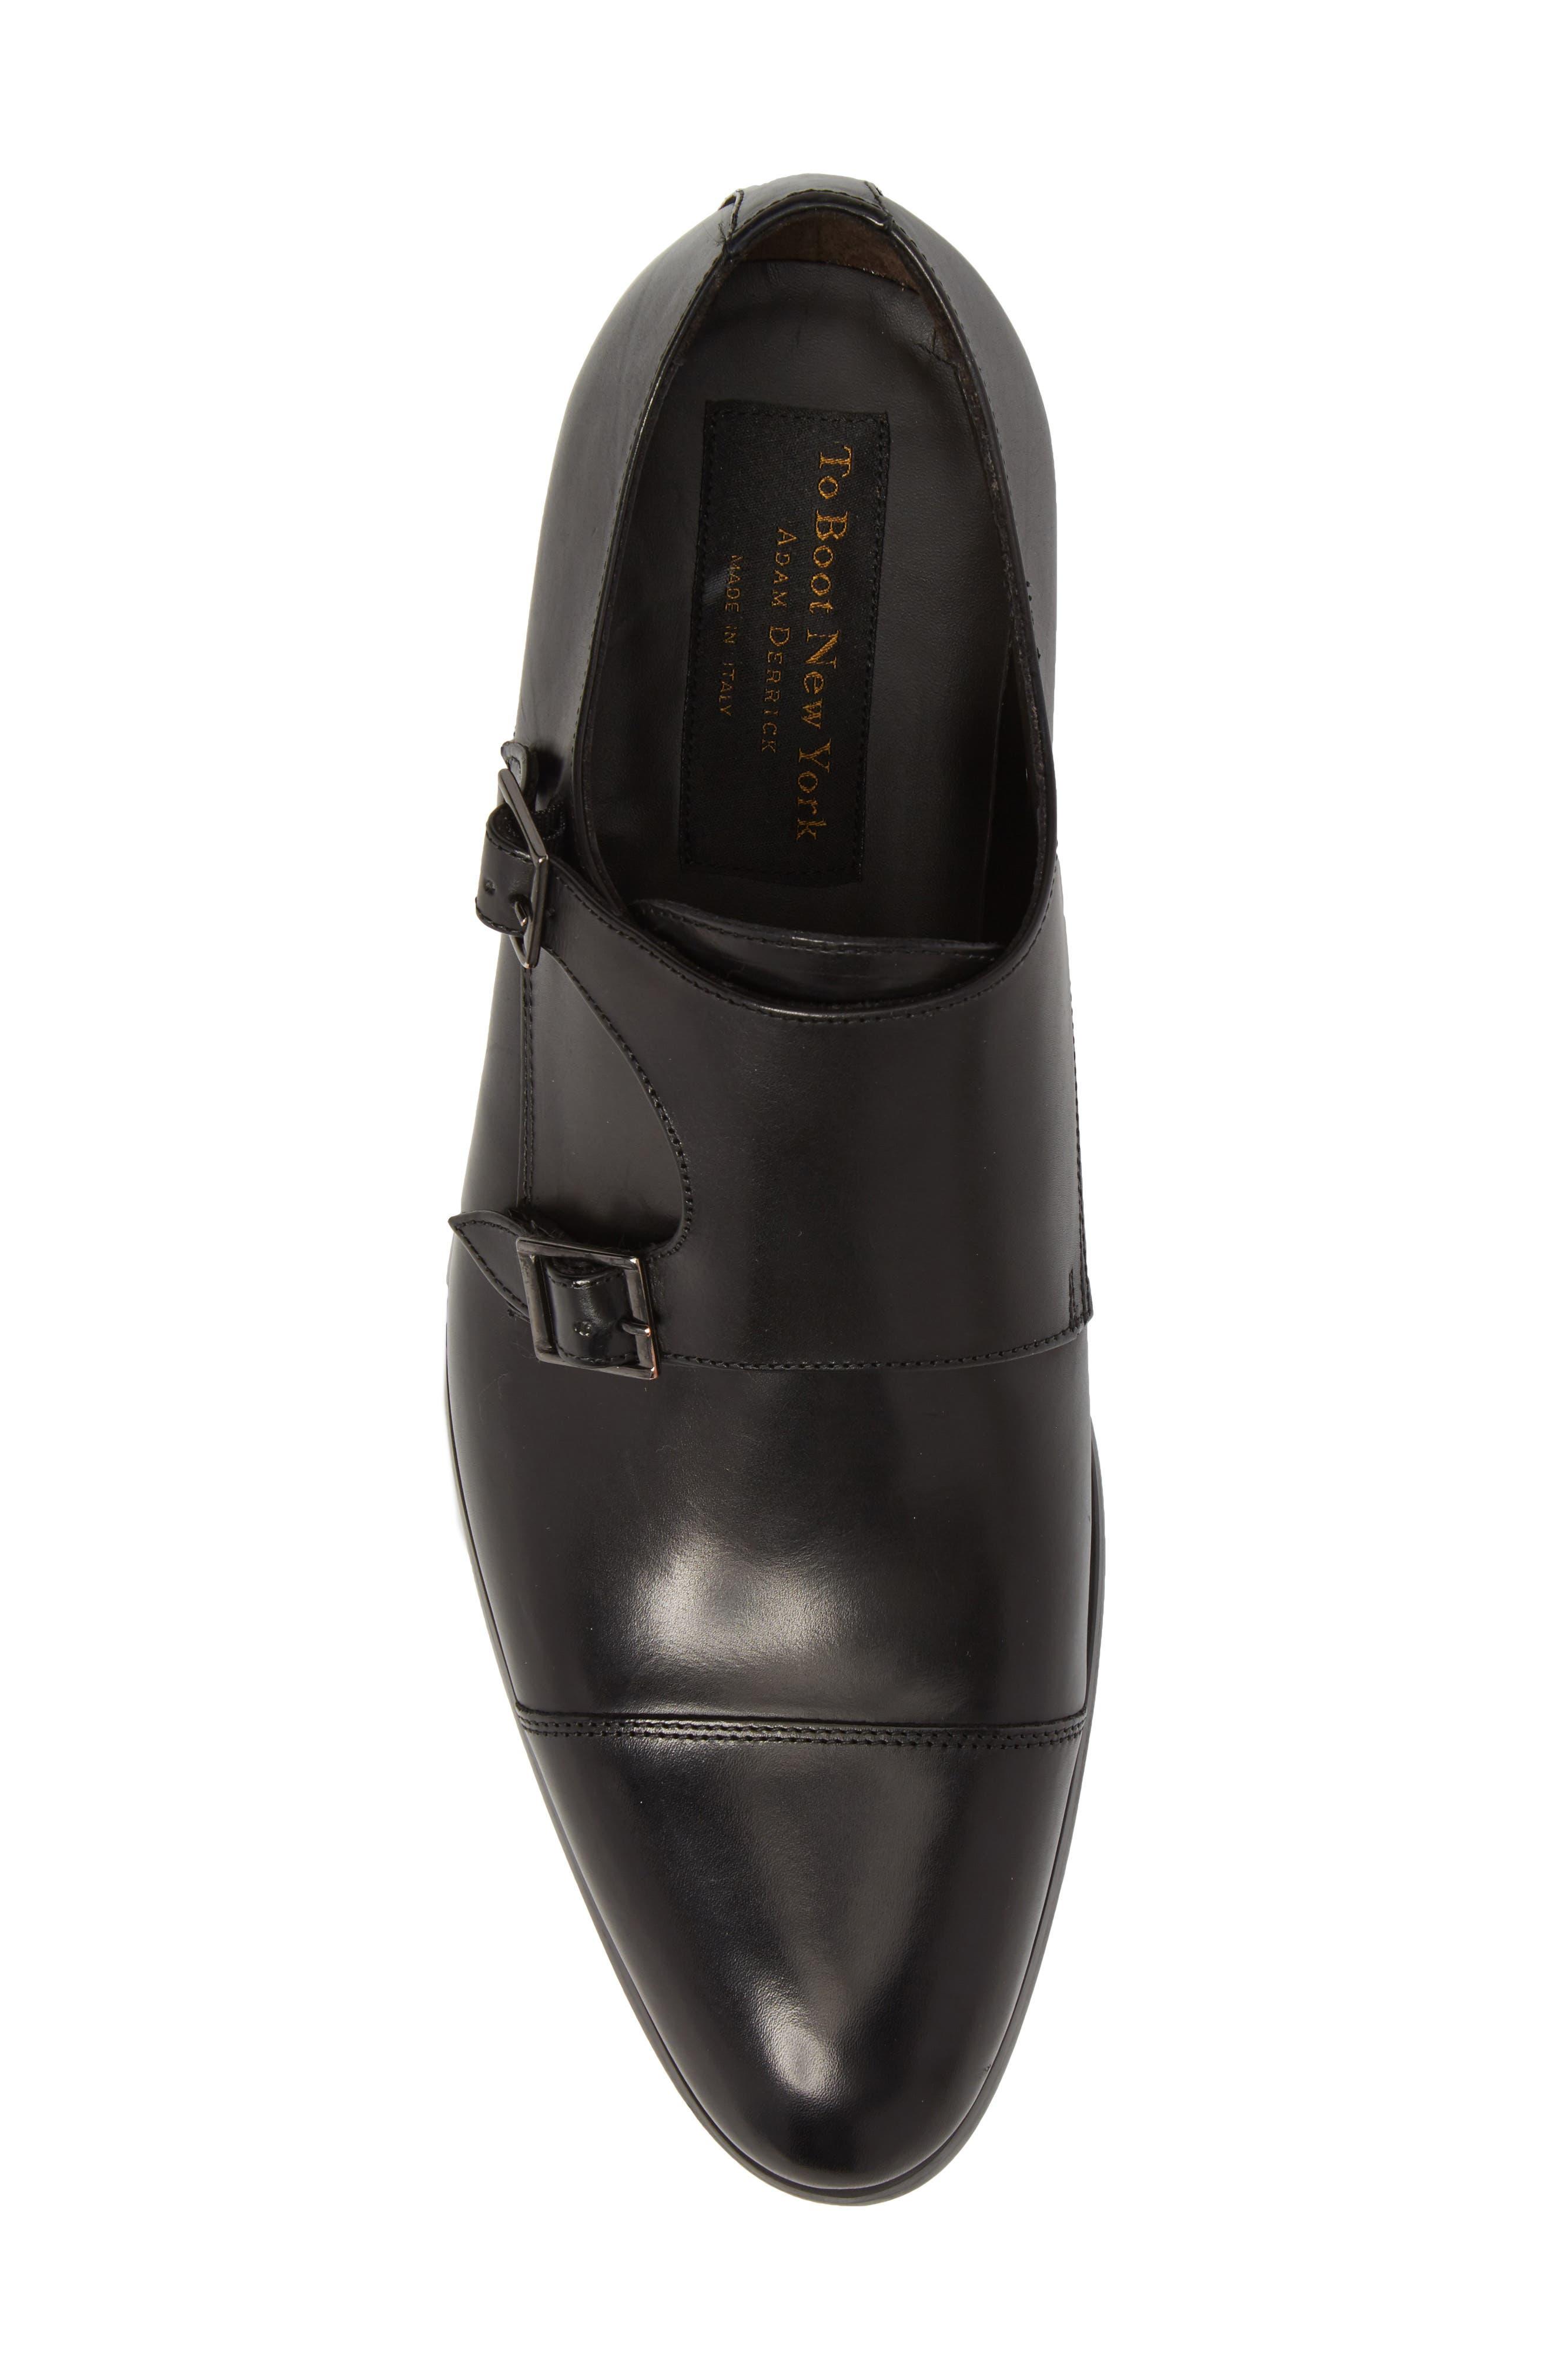 Bankston Cap Toe Double Strap Monk Shoe,                             Alternate thumbnail 5, color,                             BLACK LEATHER